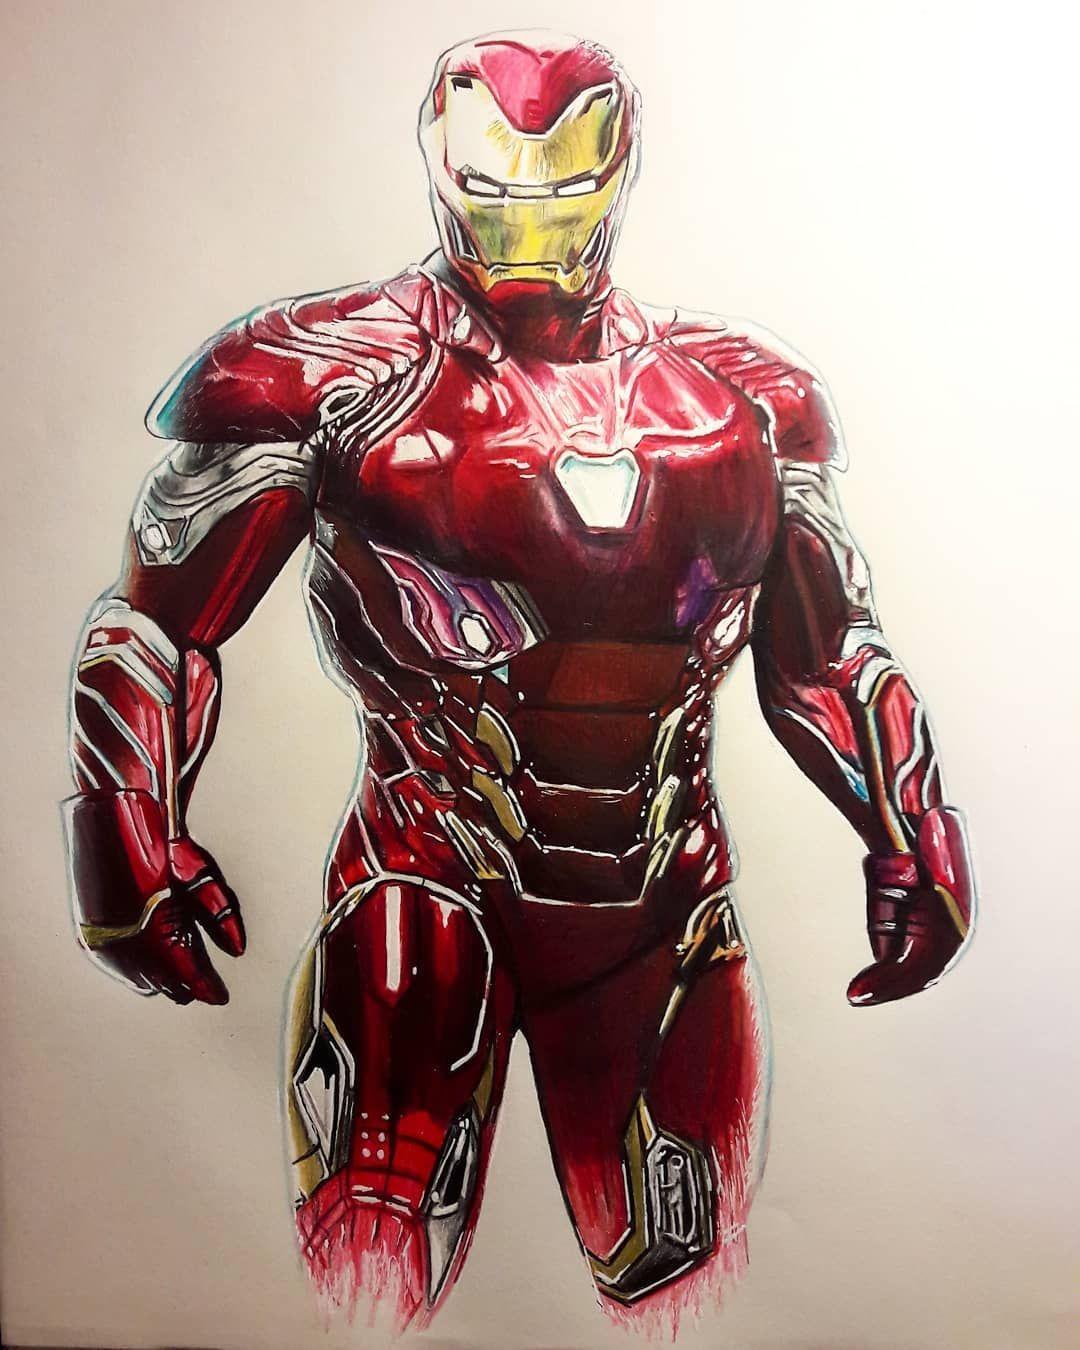 Pin By Comicpit On Iron Man Armor In 2021 Thor Drawing Iron Man Armor Comic Art